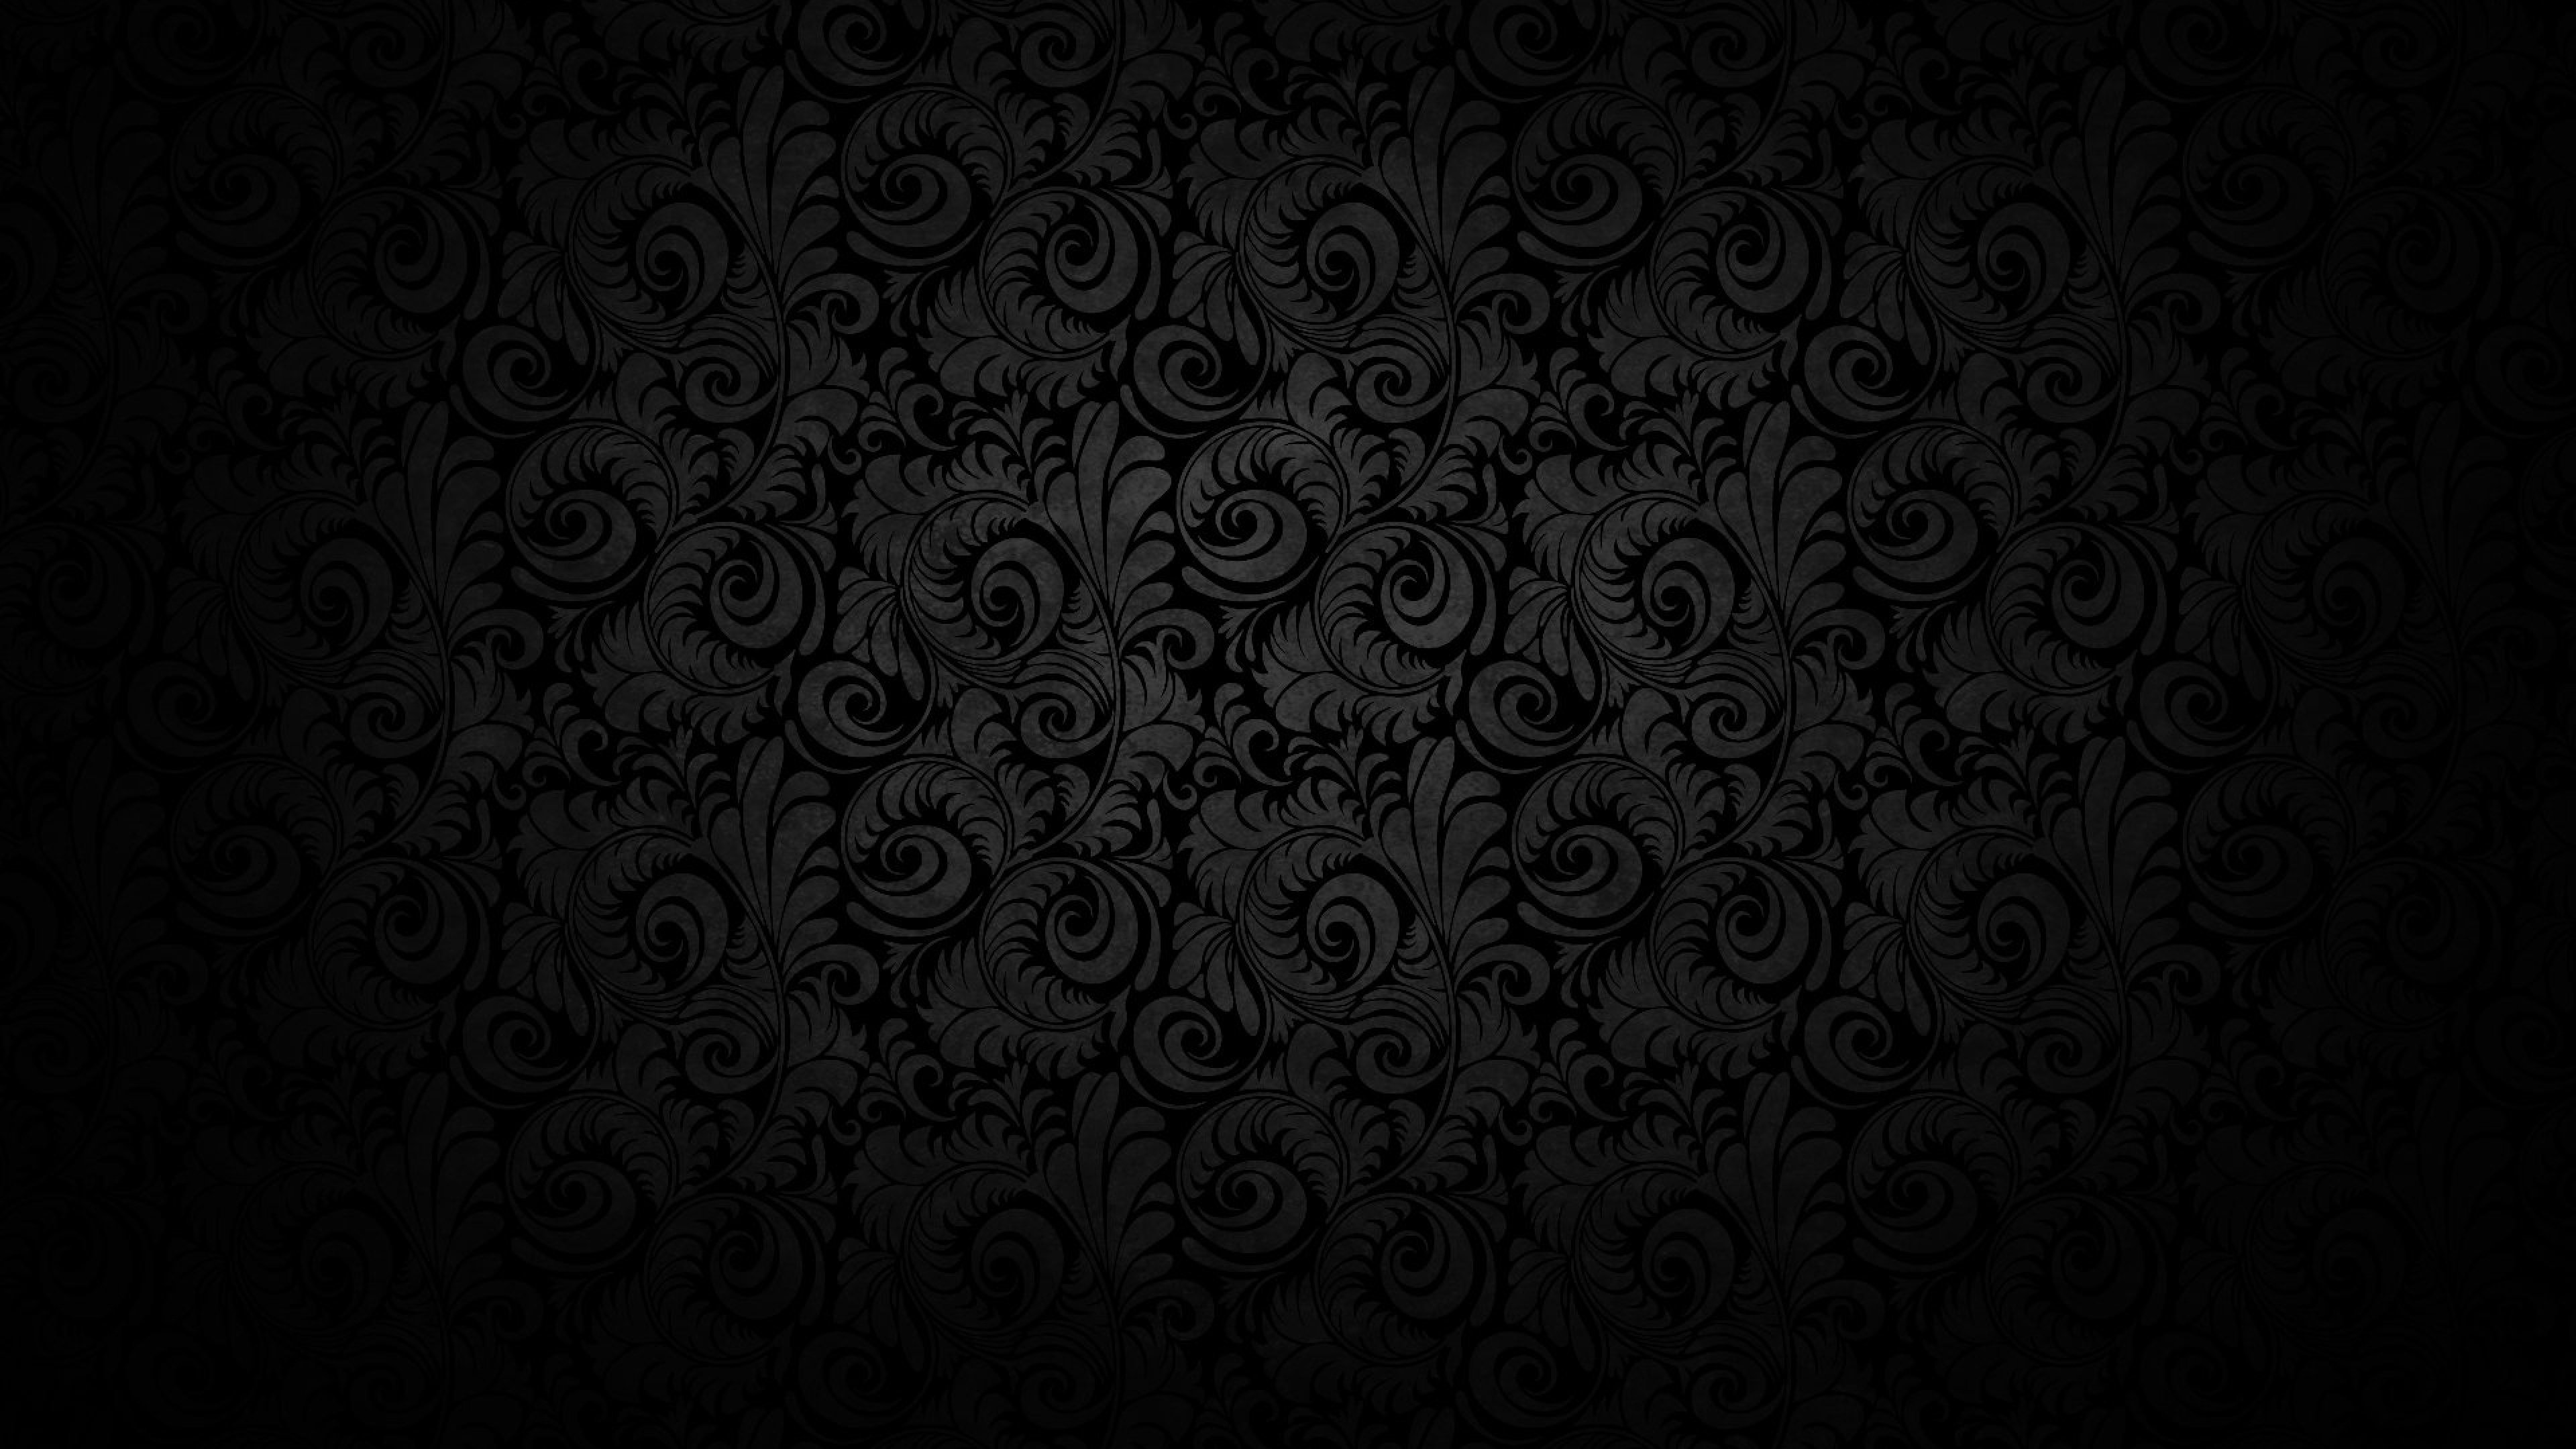 4k dark wallpaper wallpapersafari for Dark pattern background